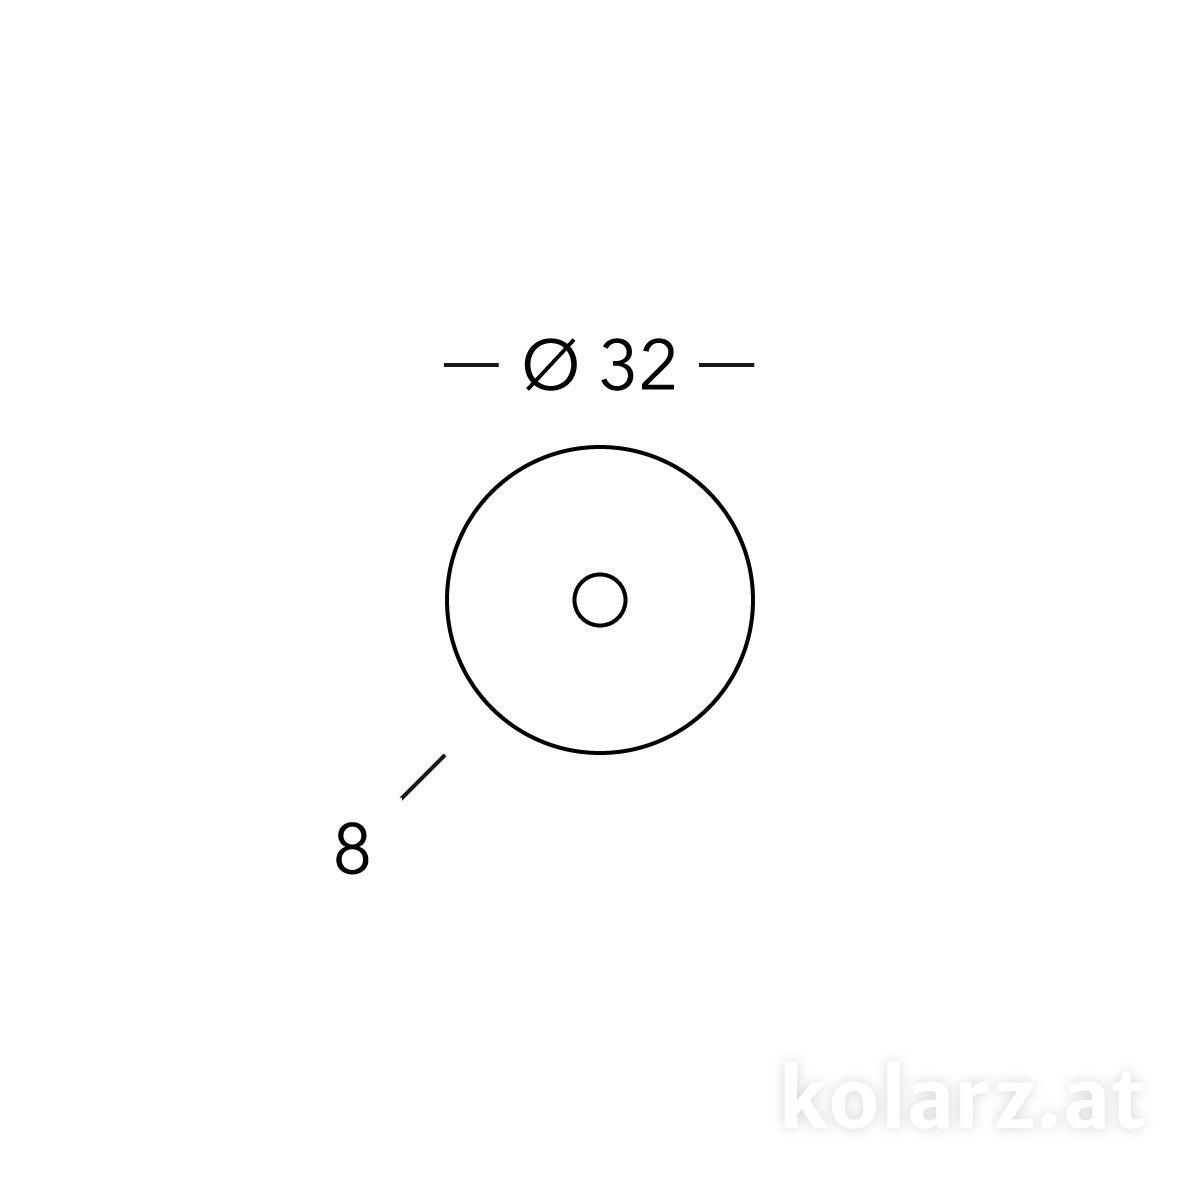 0314-U12-5-W-s1.jpg